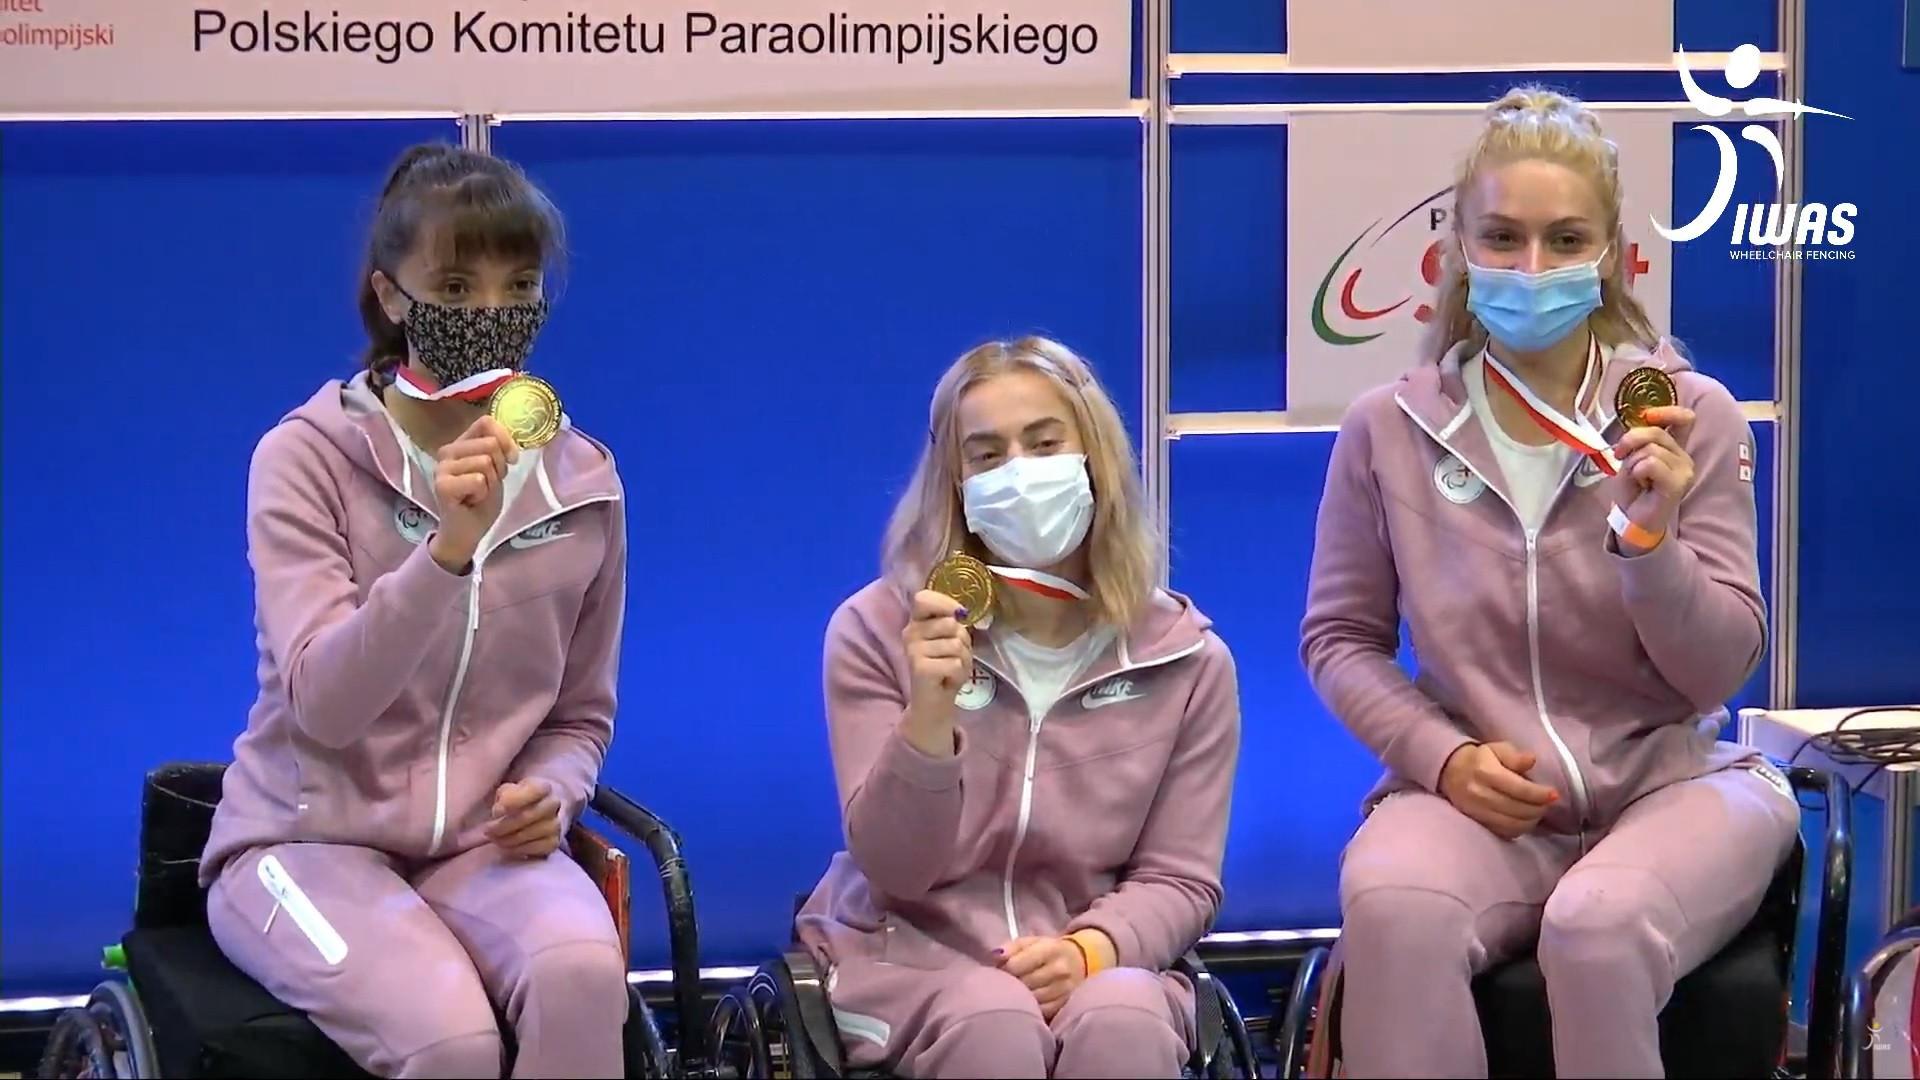 Ukraine and Georgia claim wheelchair fencing world team sabre titles in Poland